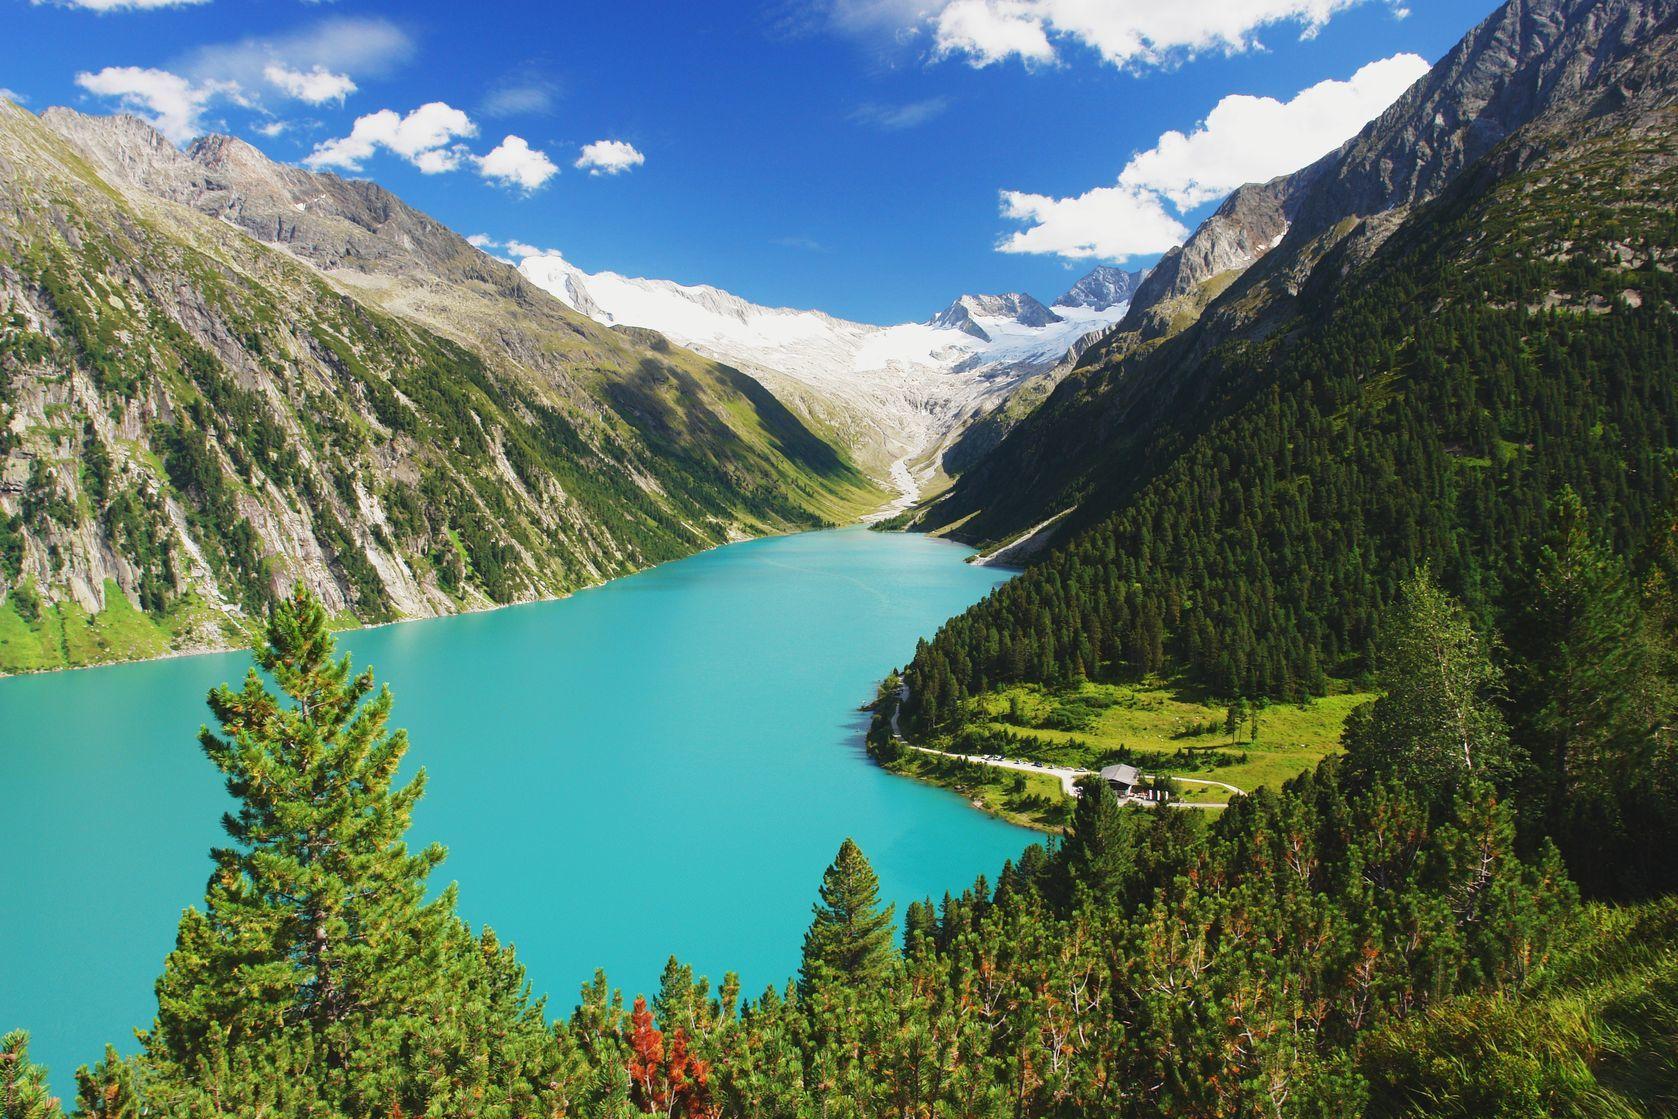 Horská krajina v Rakousku | mildax/123RF.com